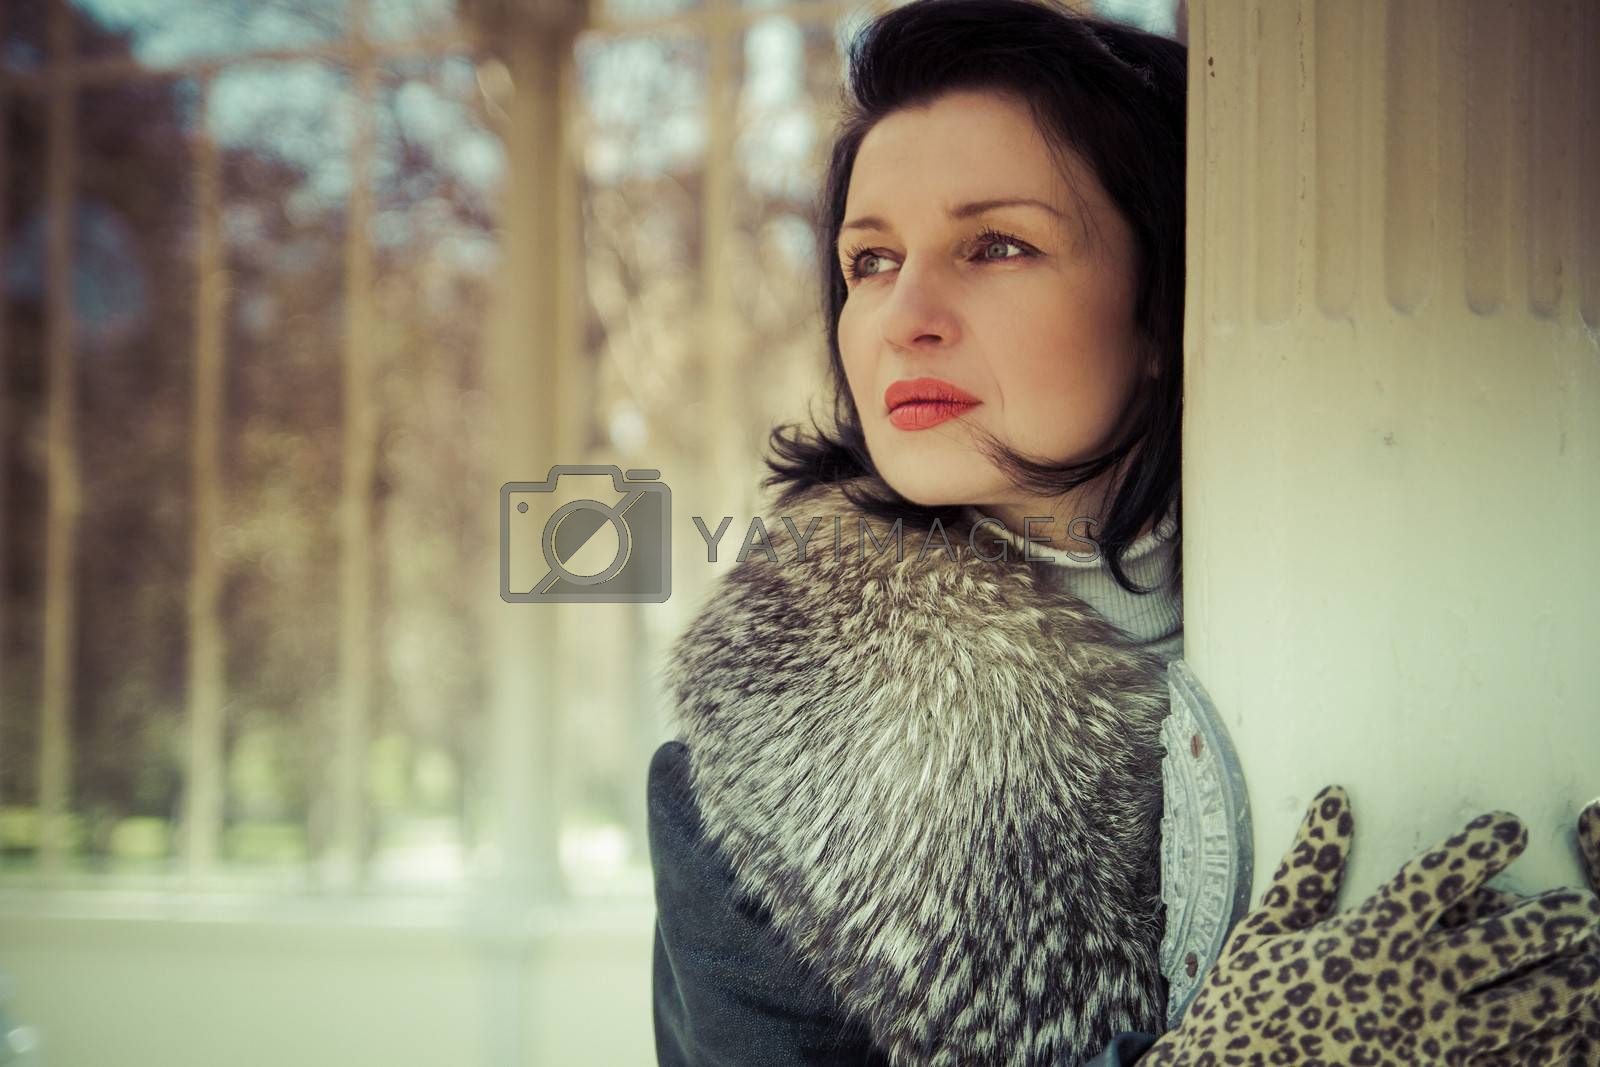 Palace.Beautiful woman in winter.Beauty Fashion Model Girl in a Fur Hat. Russian Stylish young.Portrait.